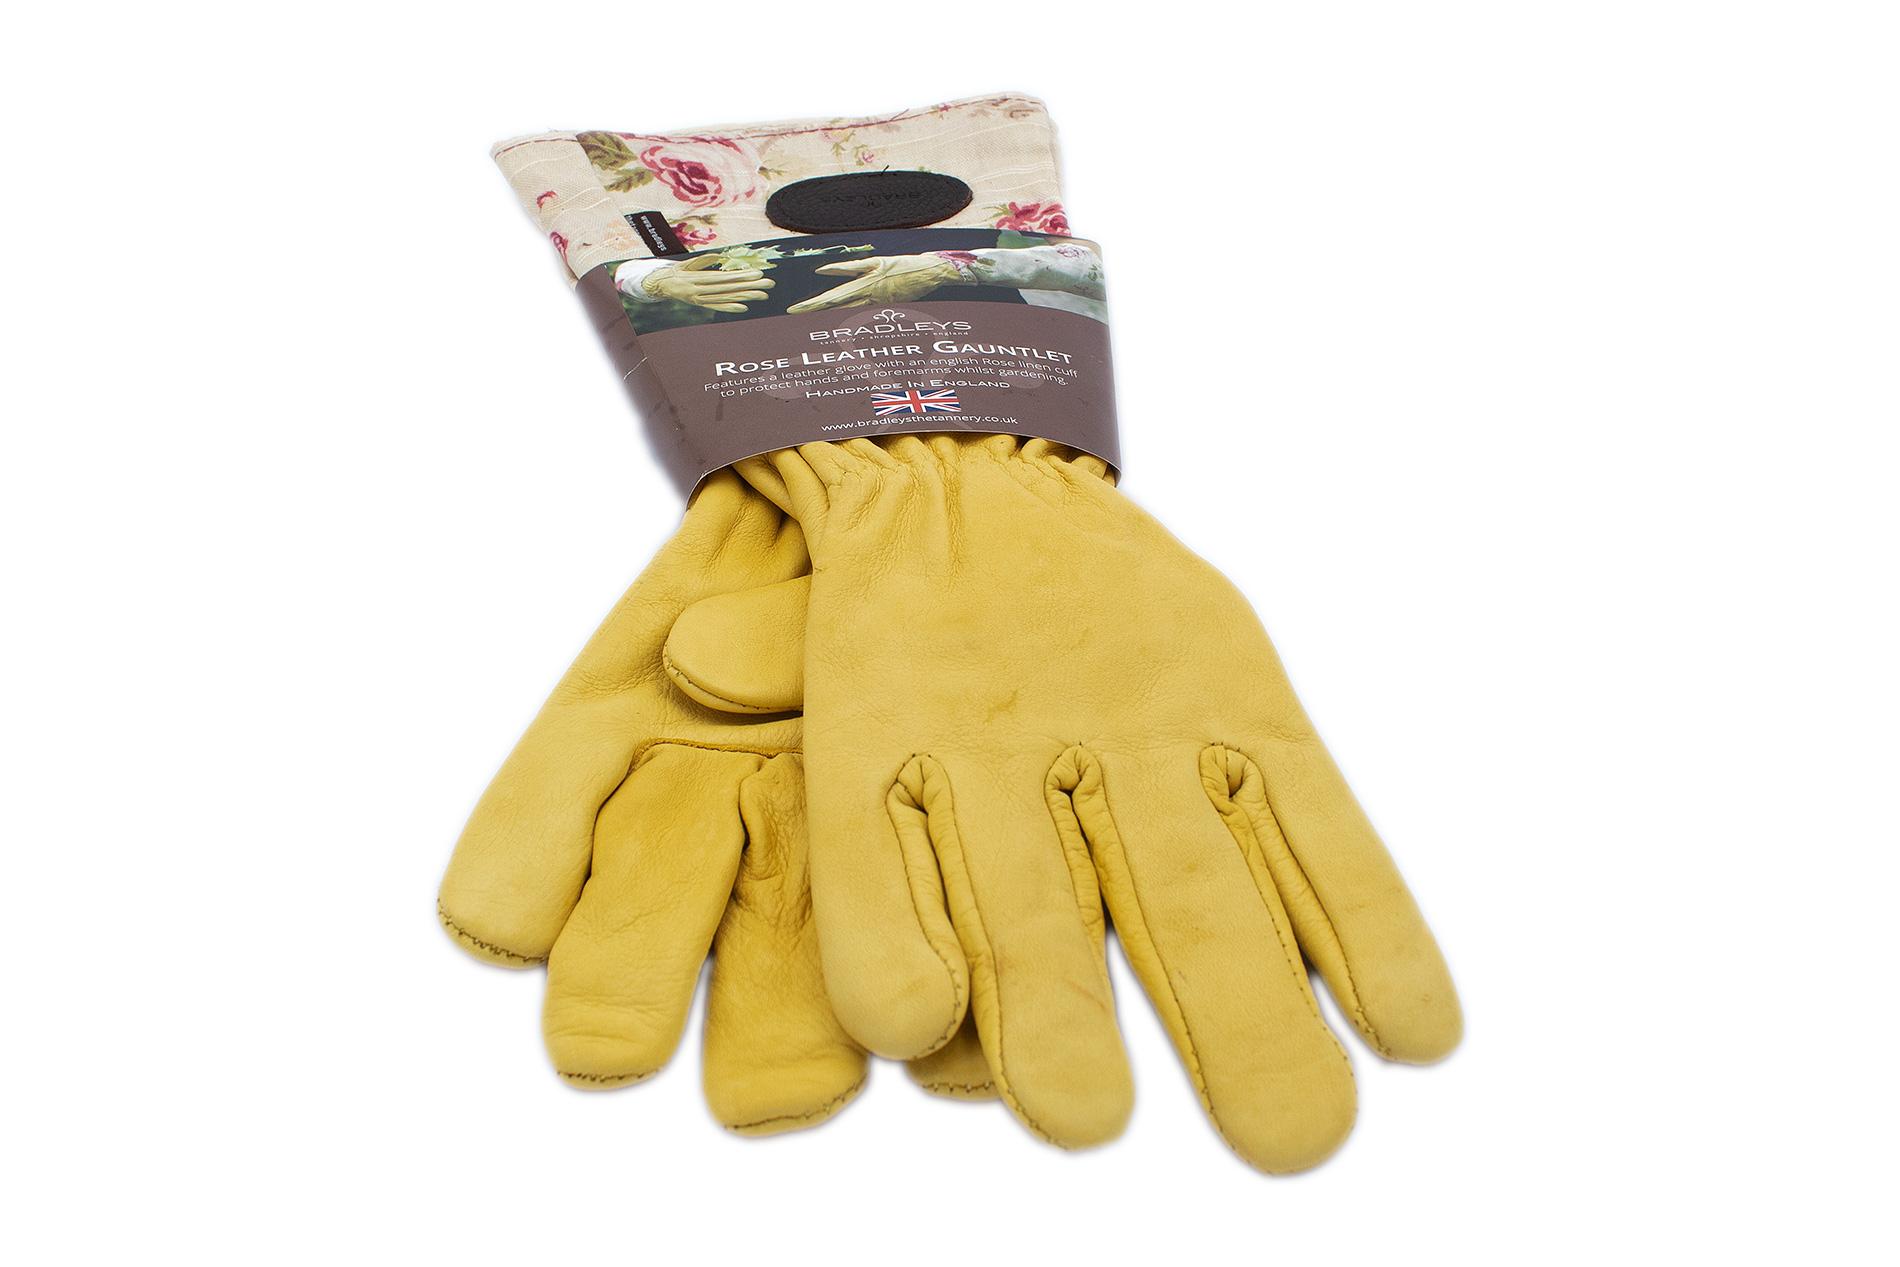 BRADLEYS Gartenhandschuhe lang, Leinen Rose beige, Gr. L (Hand Leder ocker)